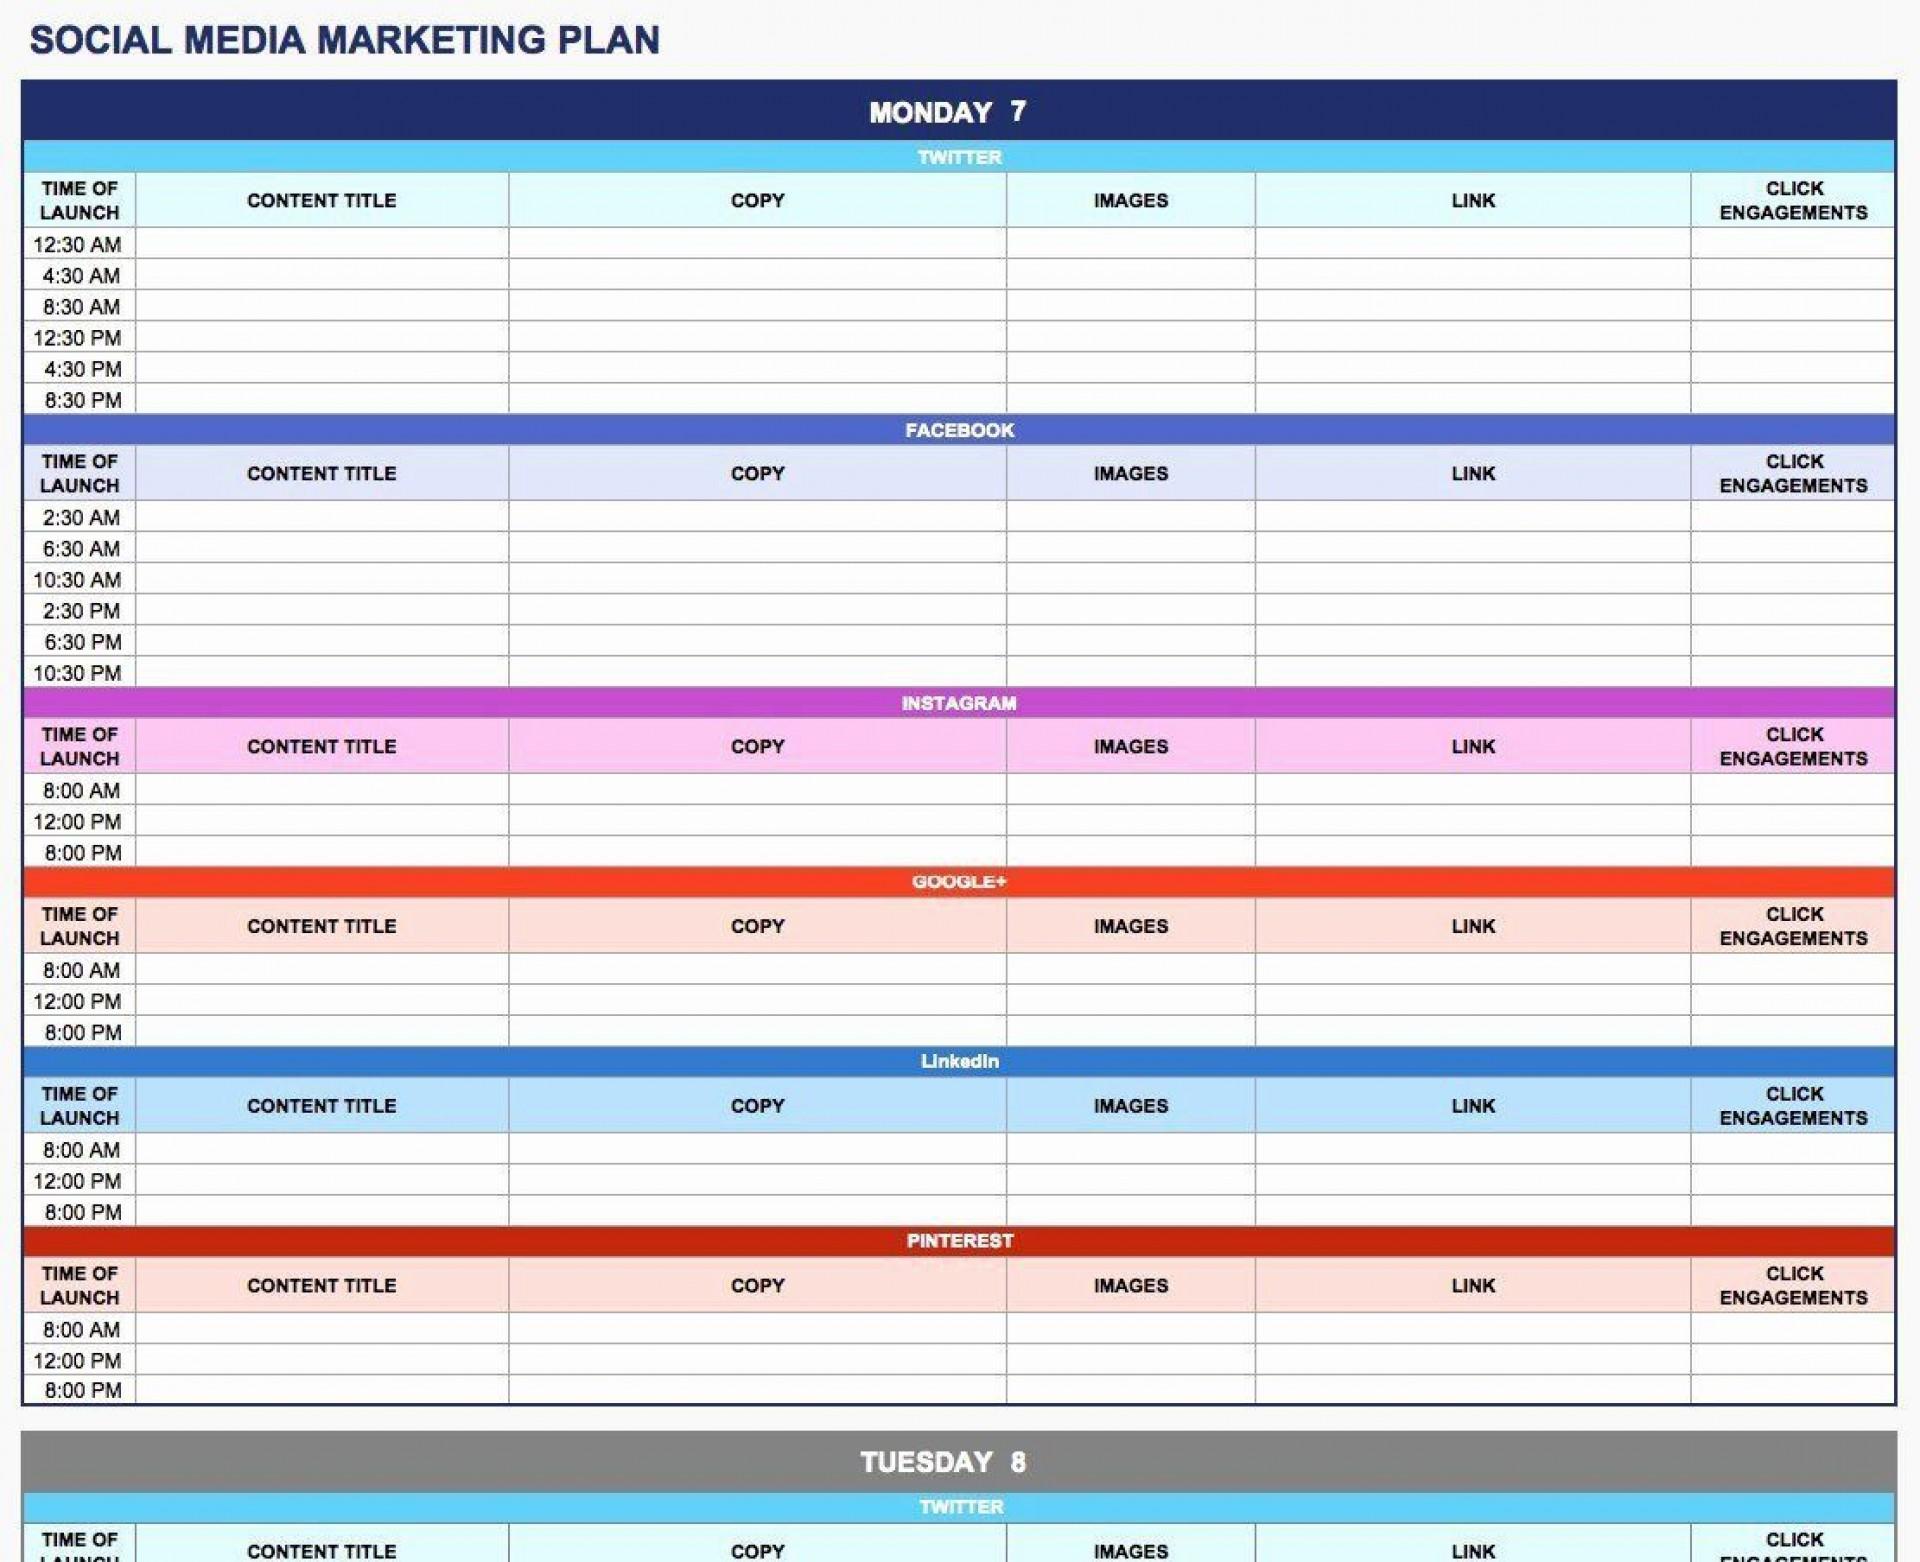 003 Rare Social Media Plan Template High Resolution  Doc Download Marketing Excel1920